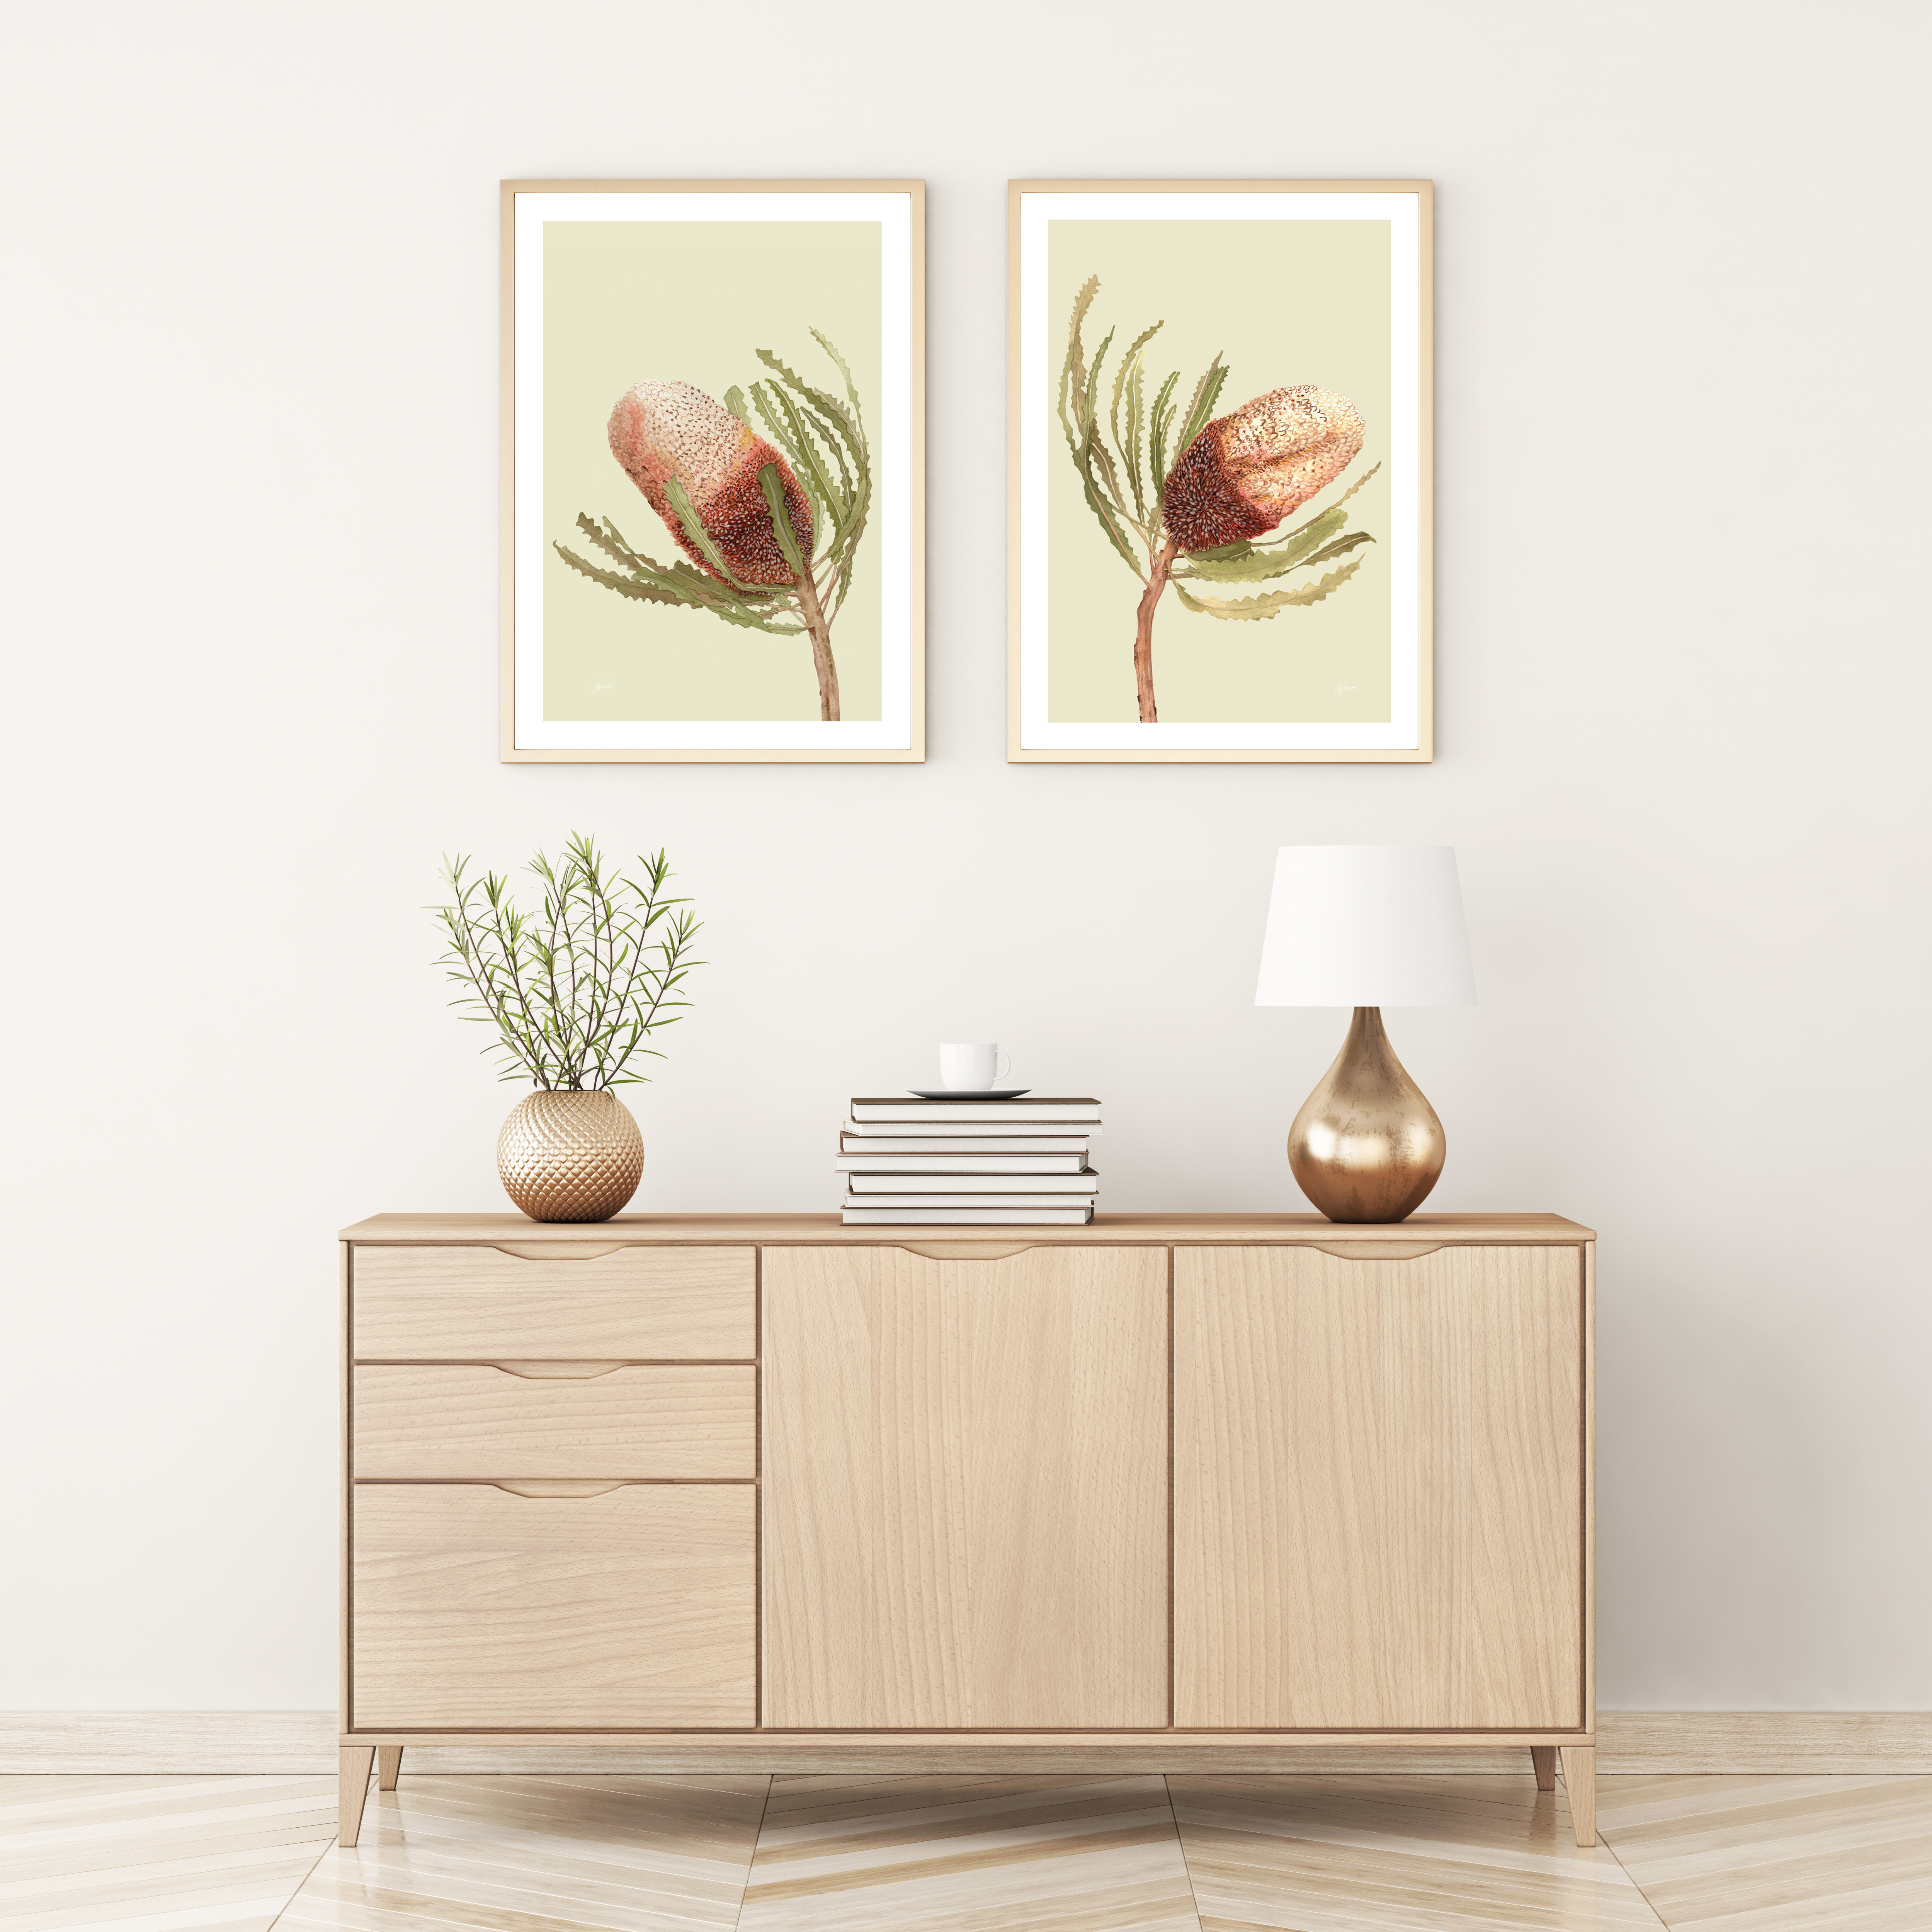 Banksia Native Living Art Flower 1 & 2 in Pale Sage Art Print